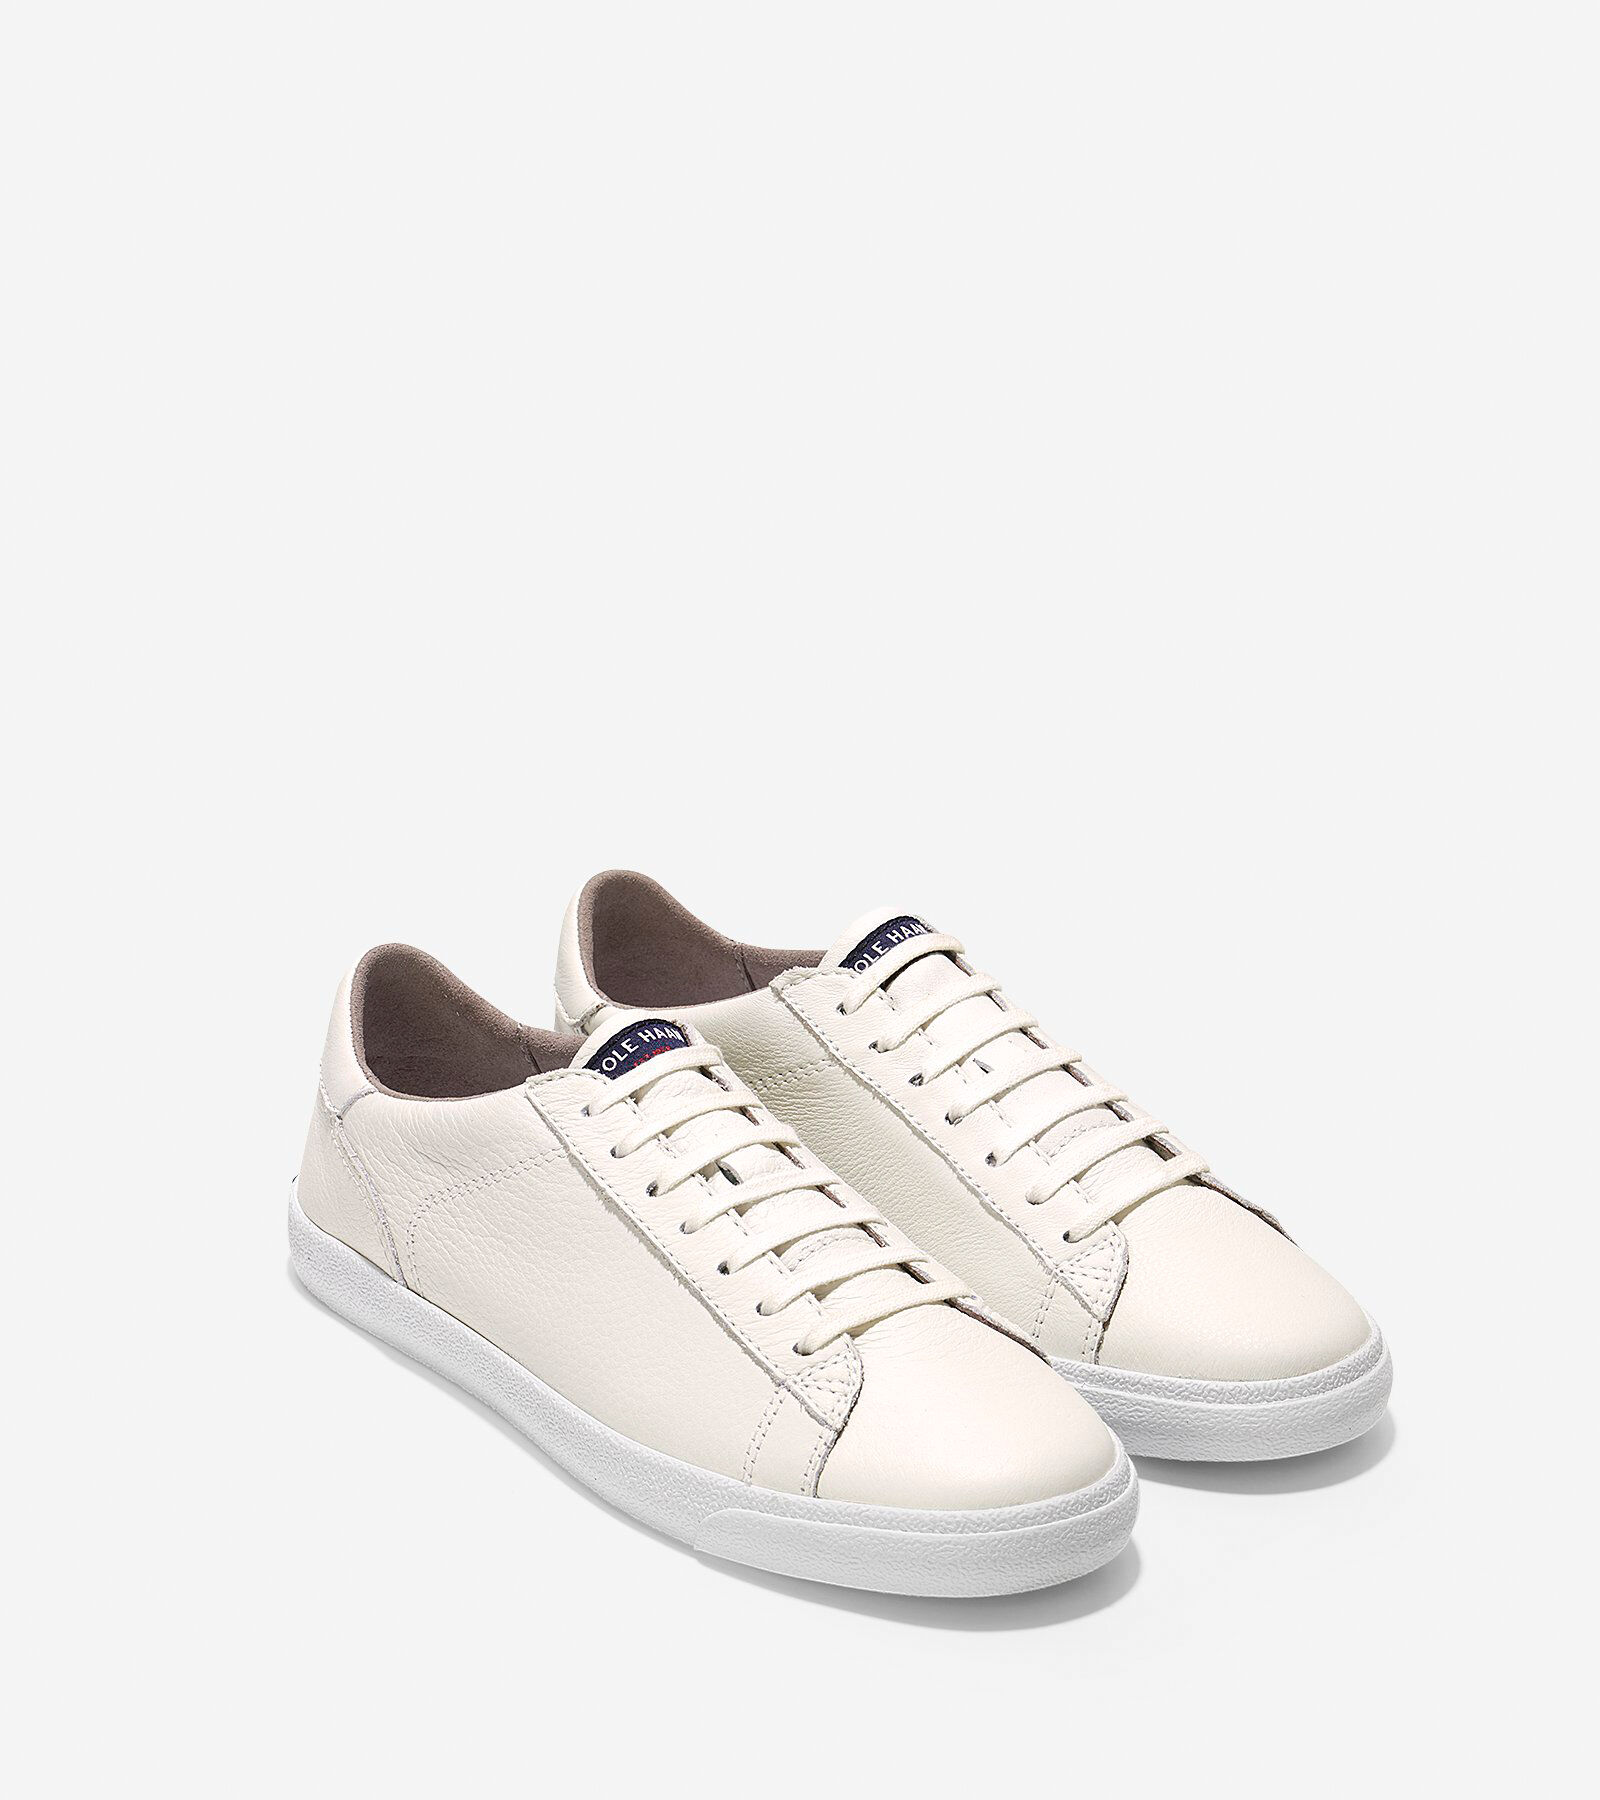 Cole Haan Trafton Club Court II Sneaker (Women's) 78fsEAnIG